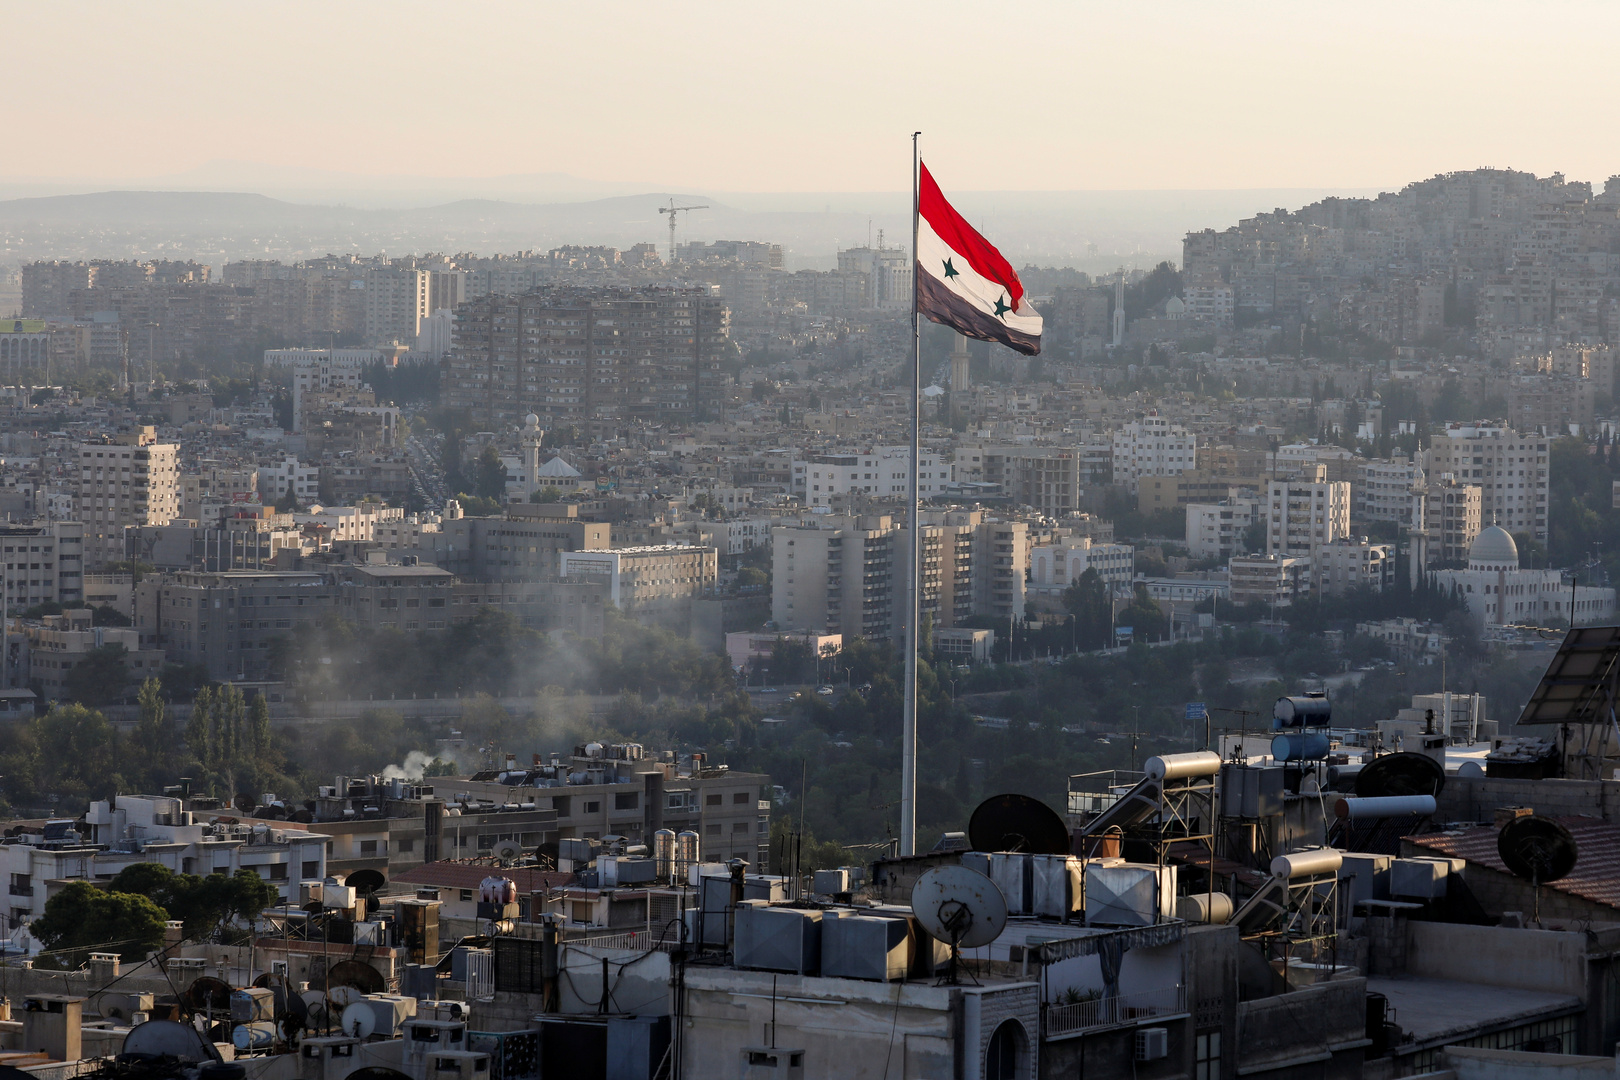 دمشق: لا يوجد رقم نهائي لخسائر سوريا وخسائر النفط والكهرباء بلغت 195 مليار دولار